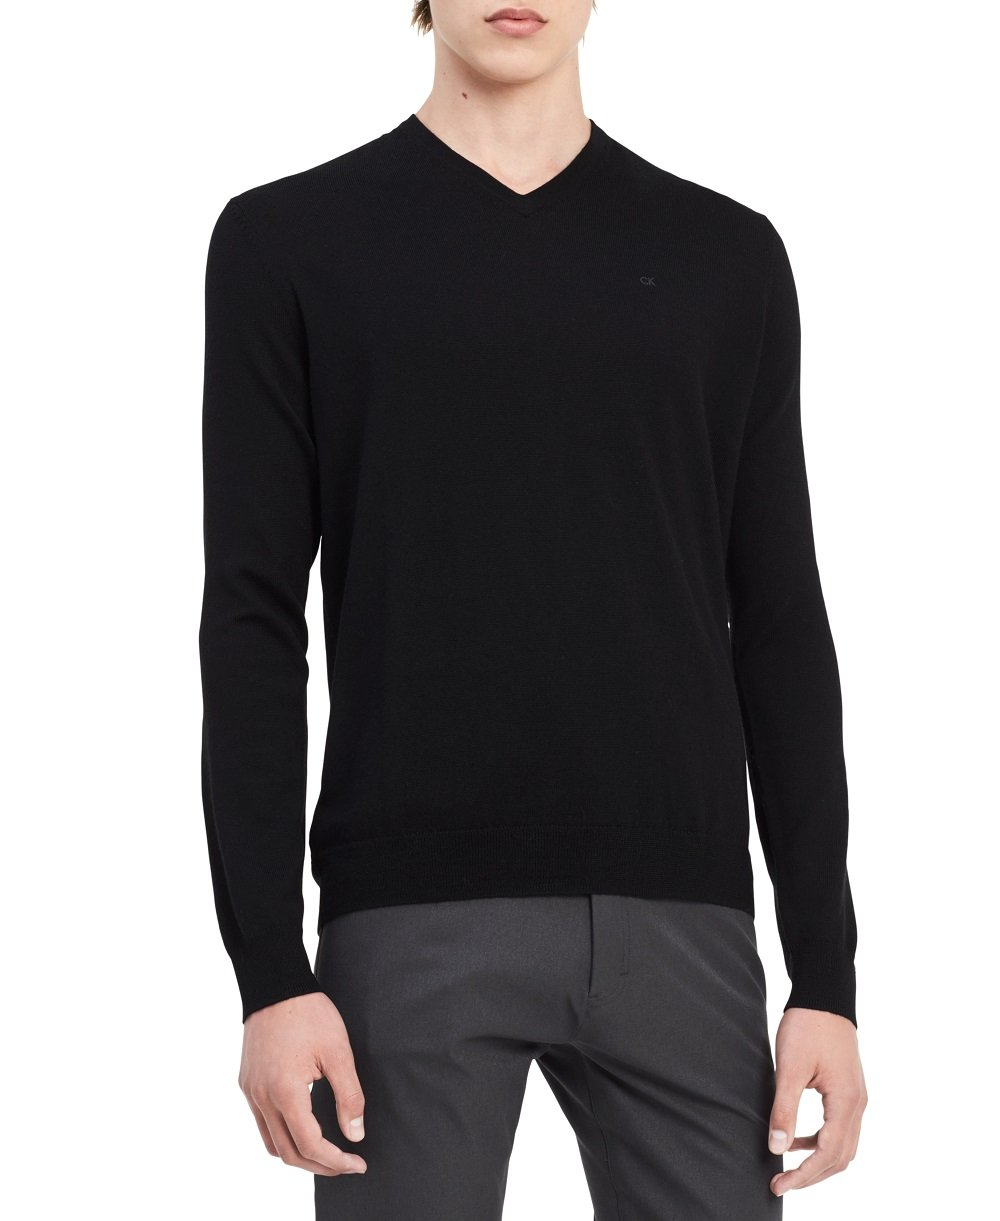 Calvin Klein Men's Merino Solid V-Neck Sweater, Black, X-Large